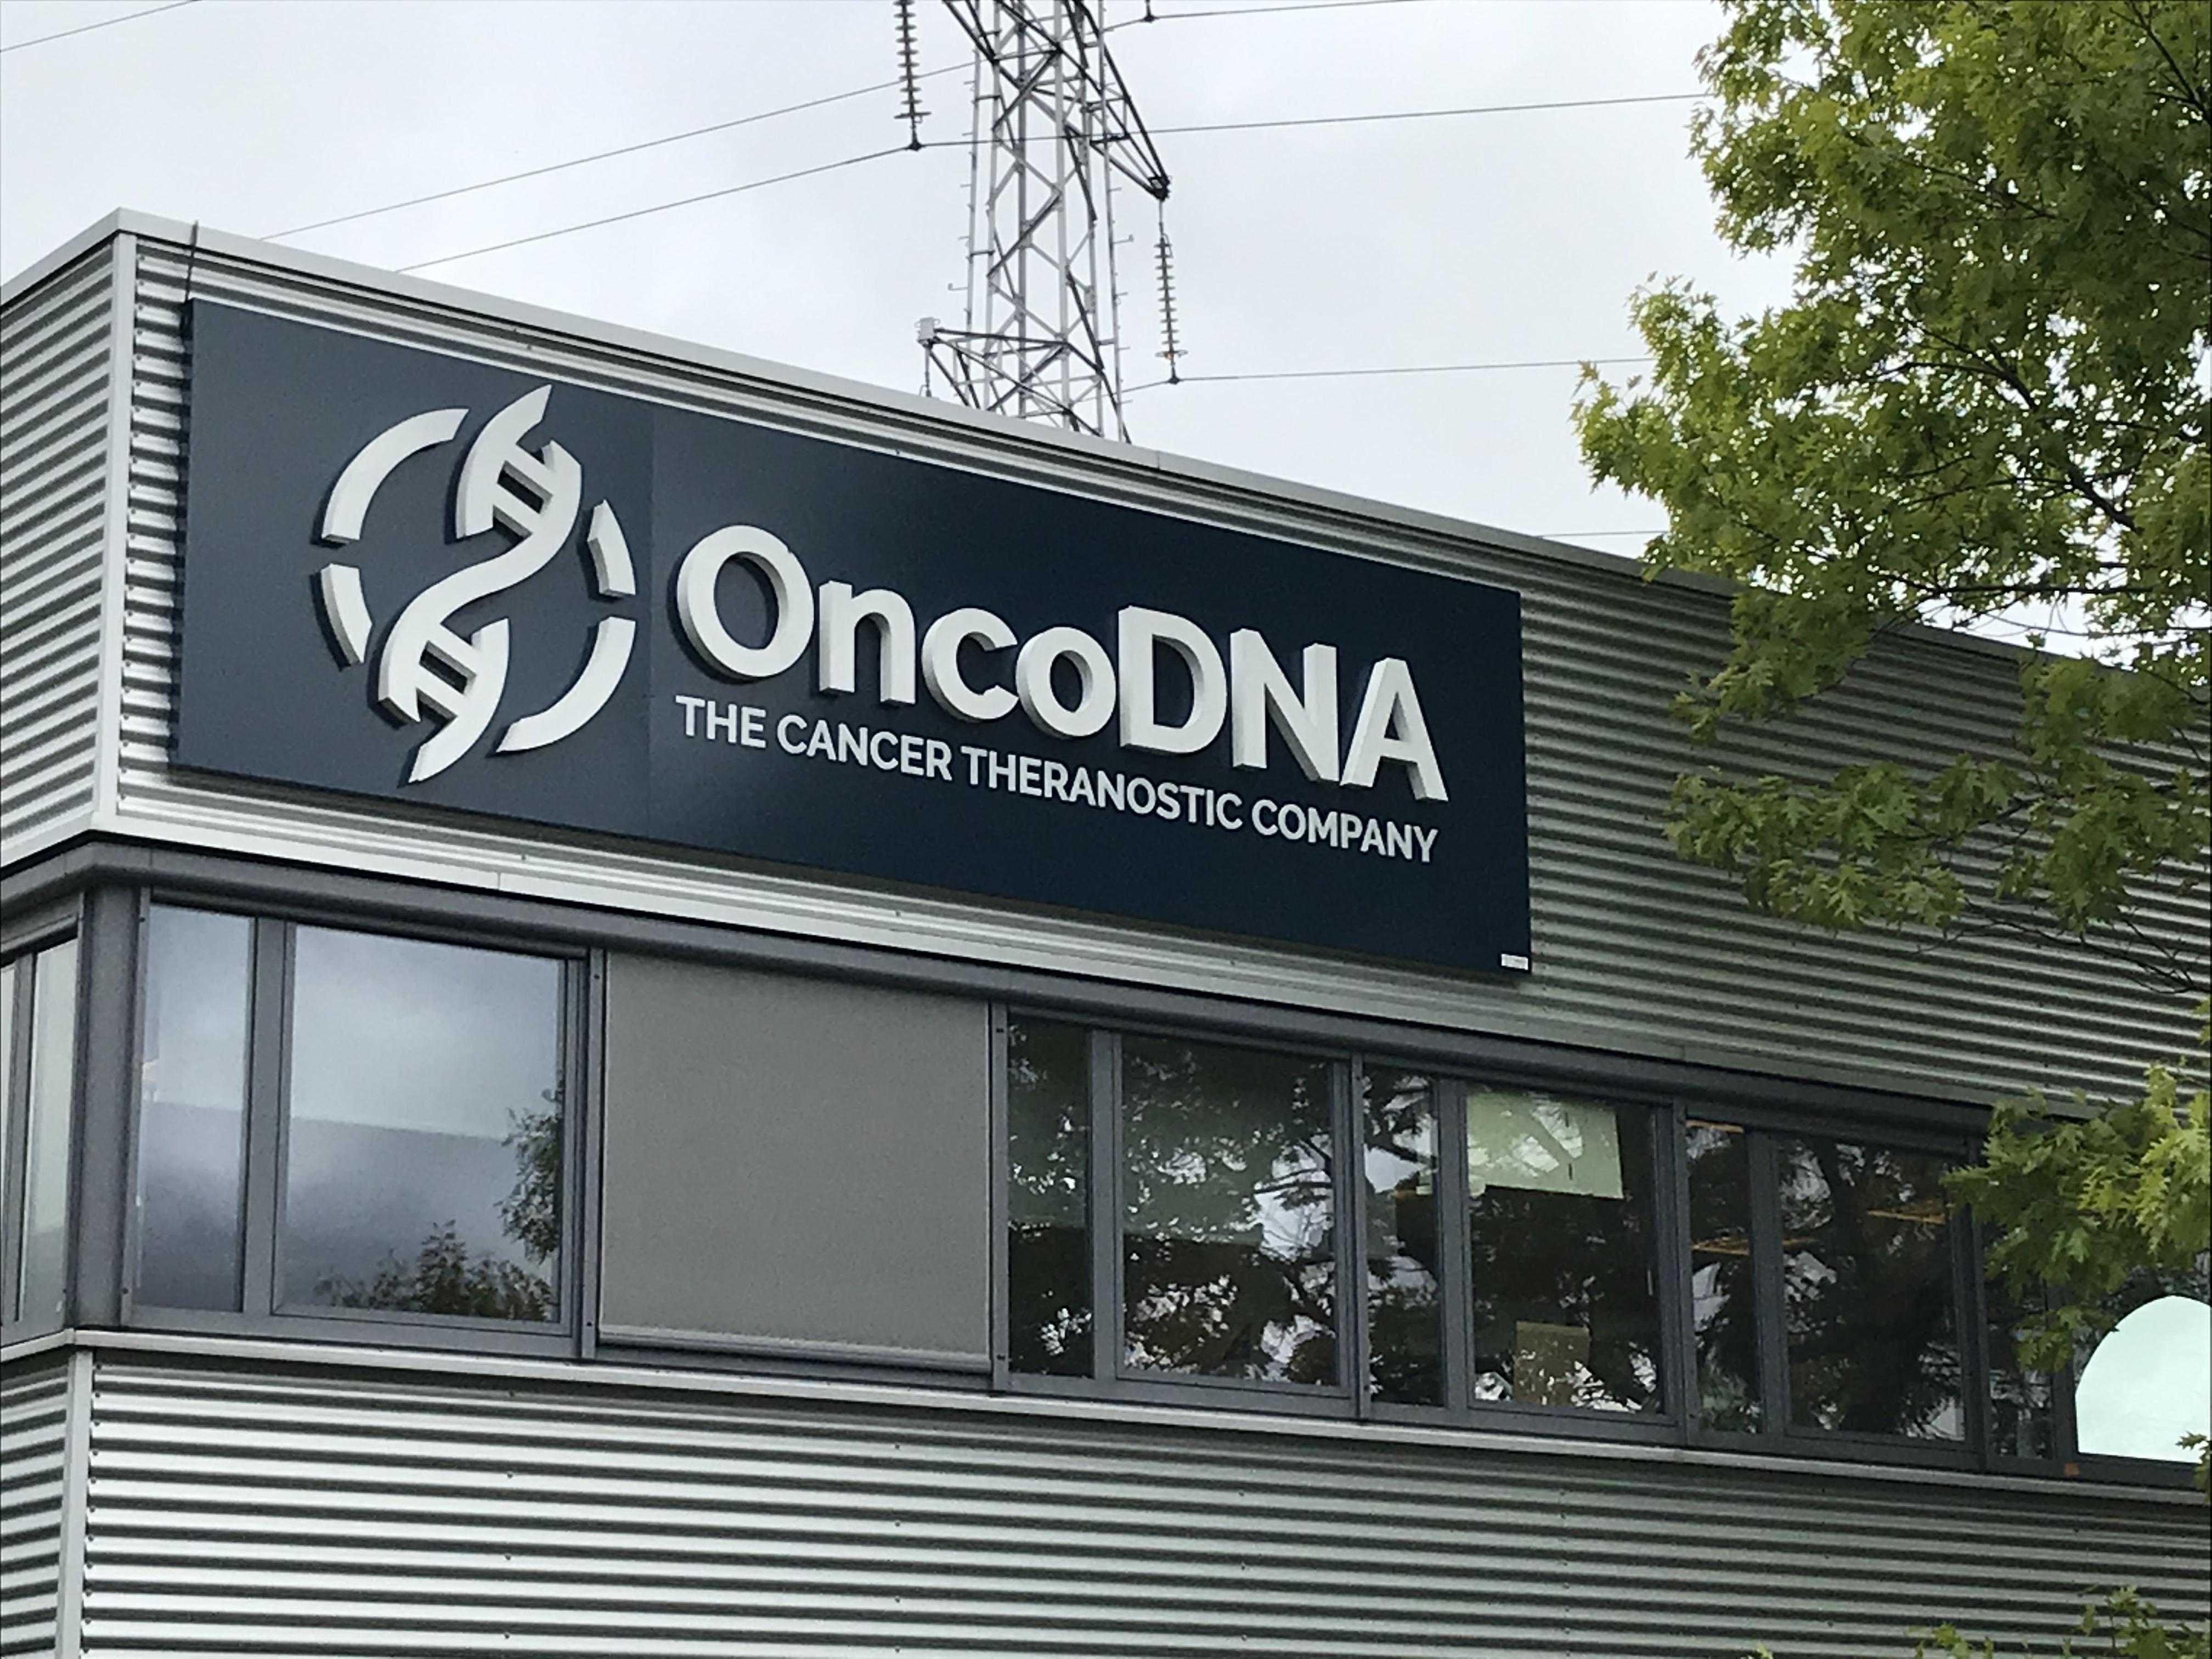 Enseigne et croix de pharmacie OncoDna Gosselies